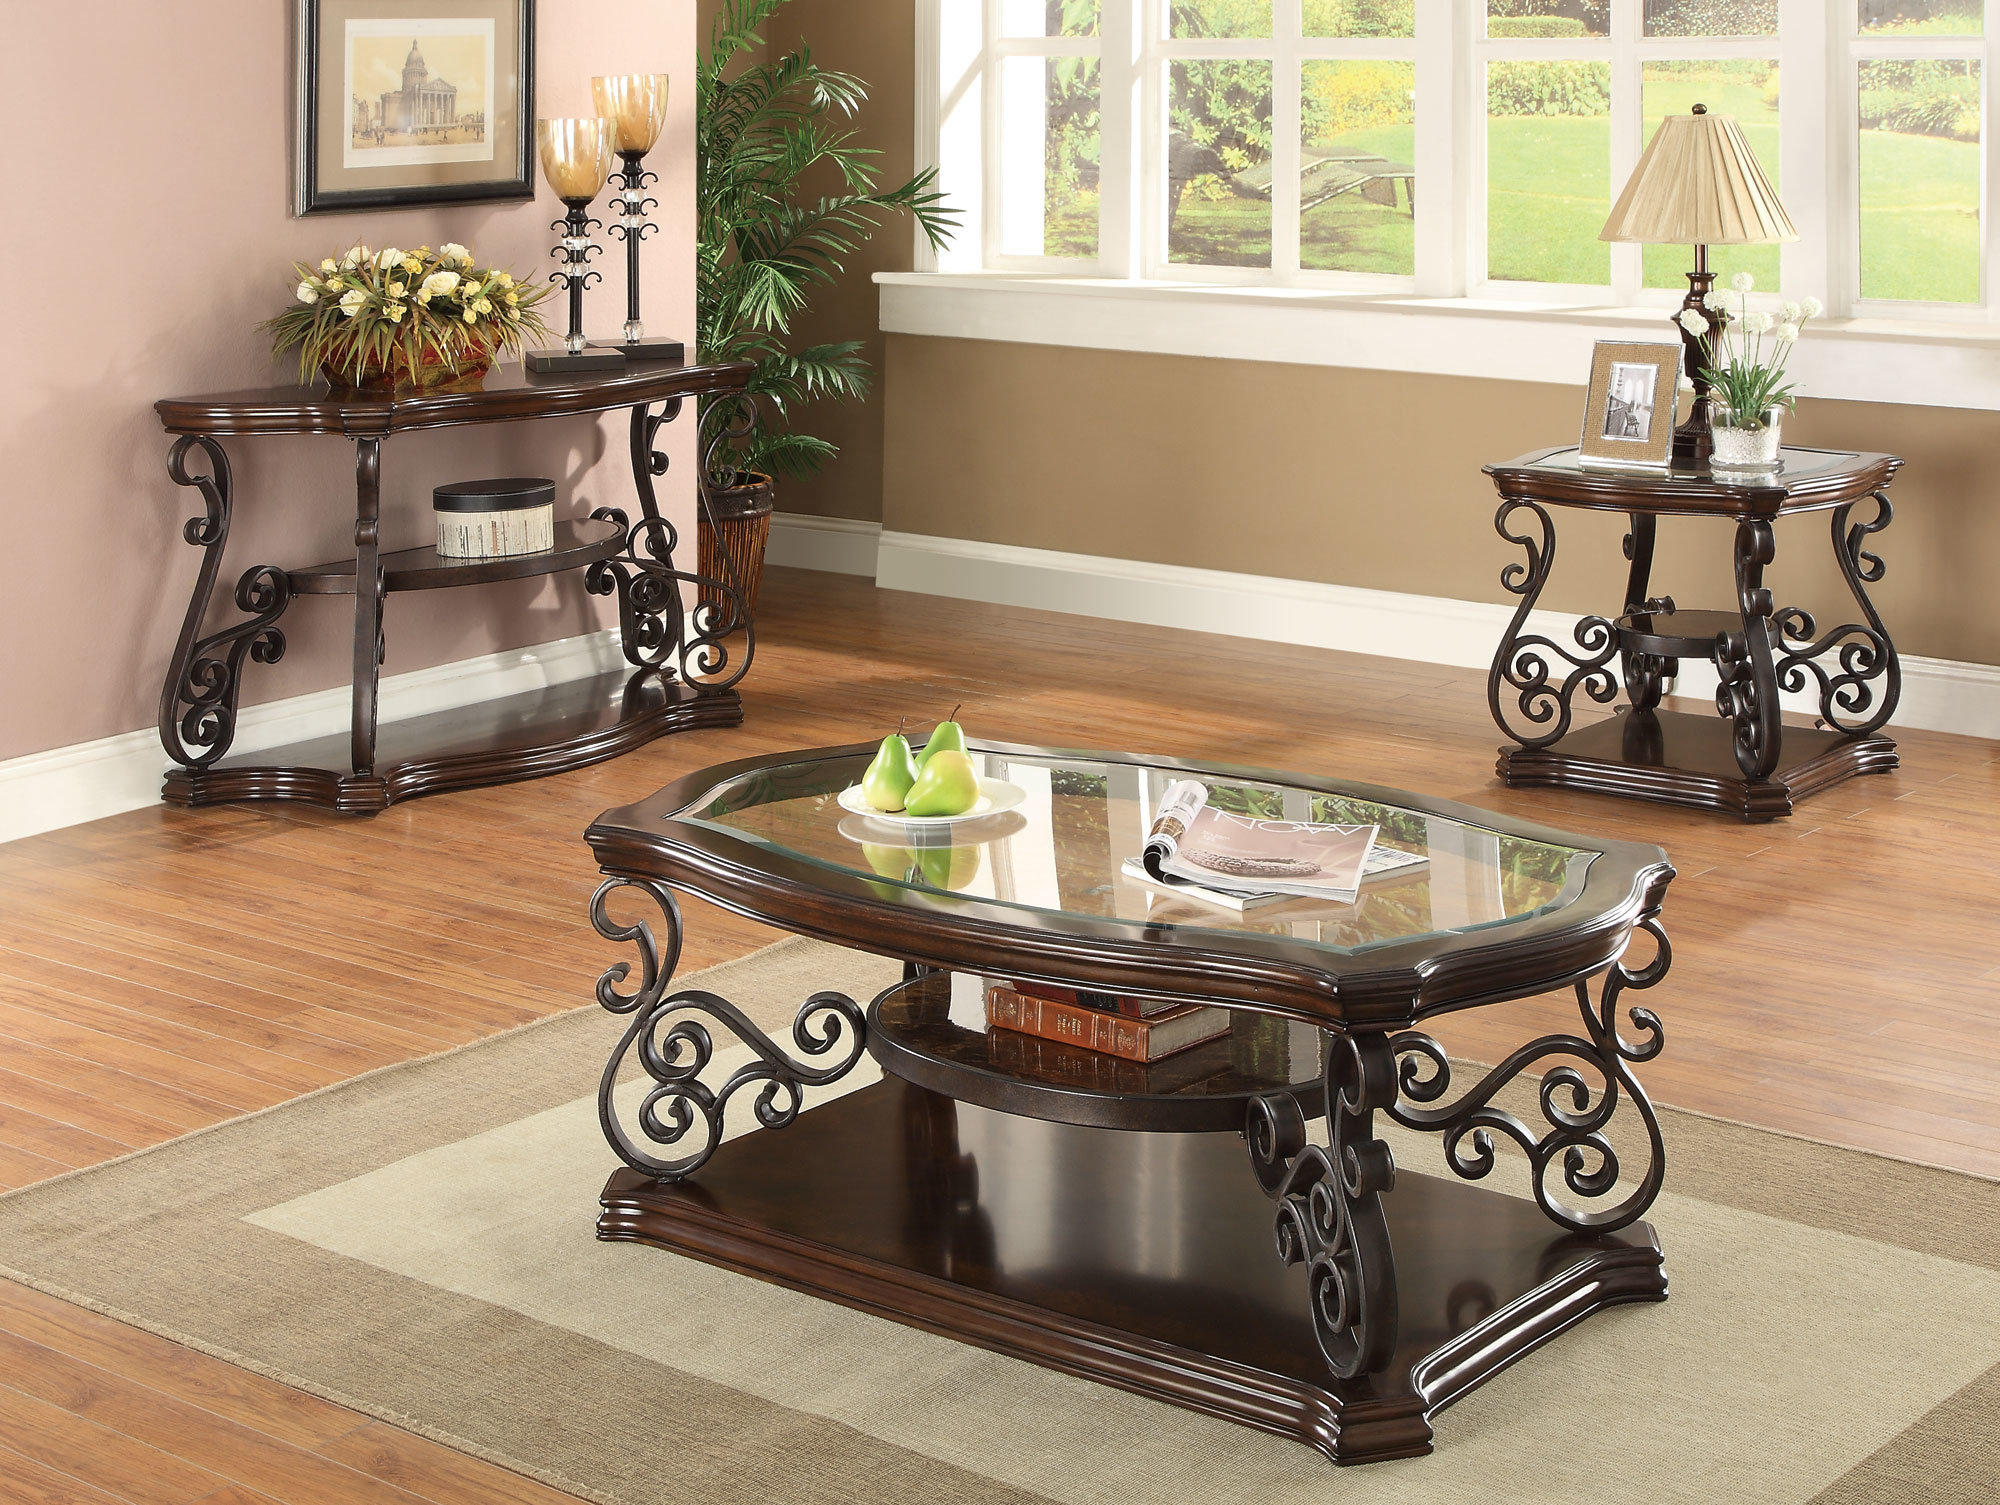 Astoria Grand Bearup 3 Piece Coffee Table Set Reviews Wayfair in sizing 2000 X 1505